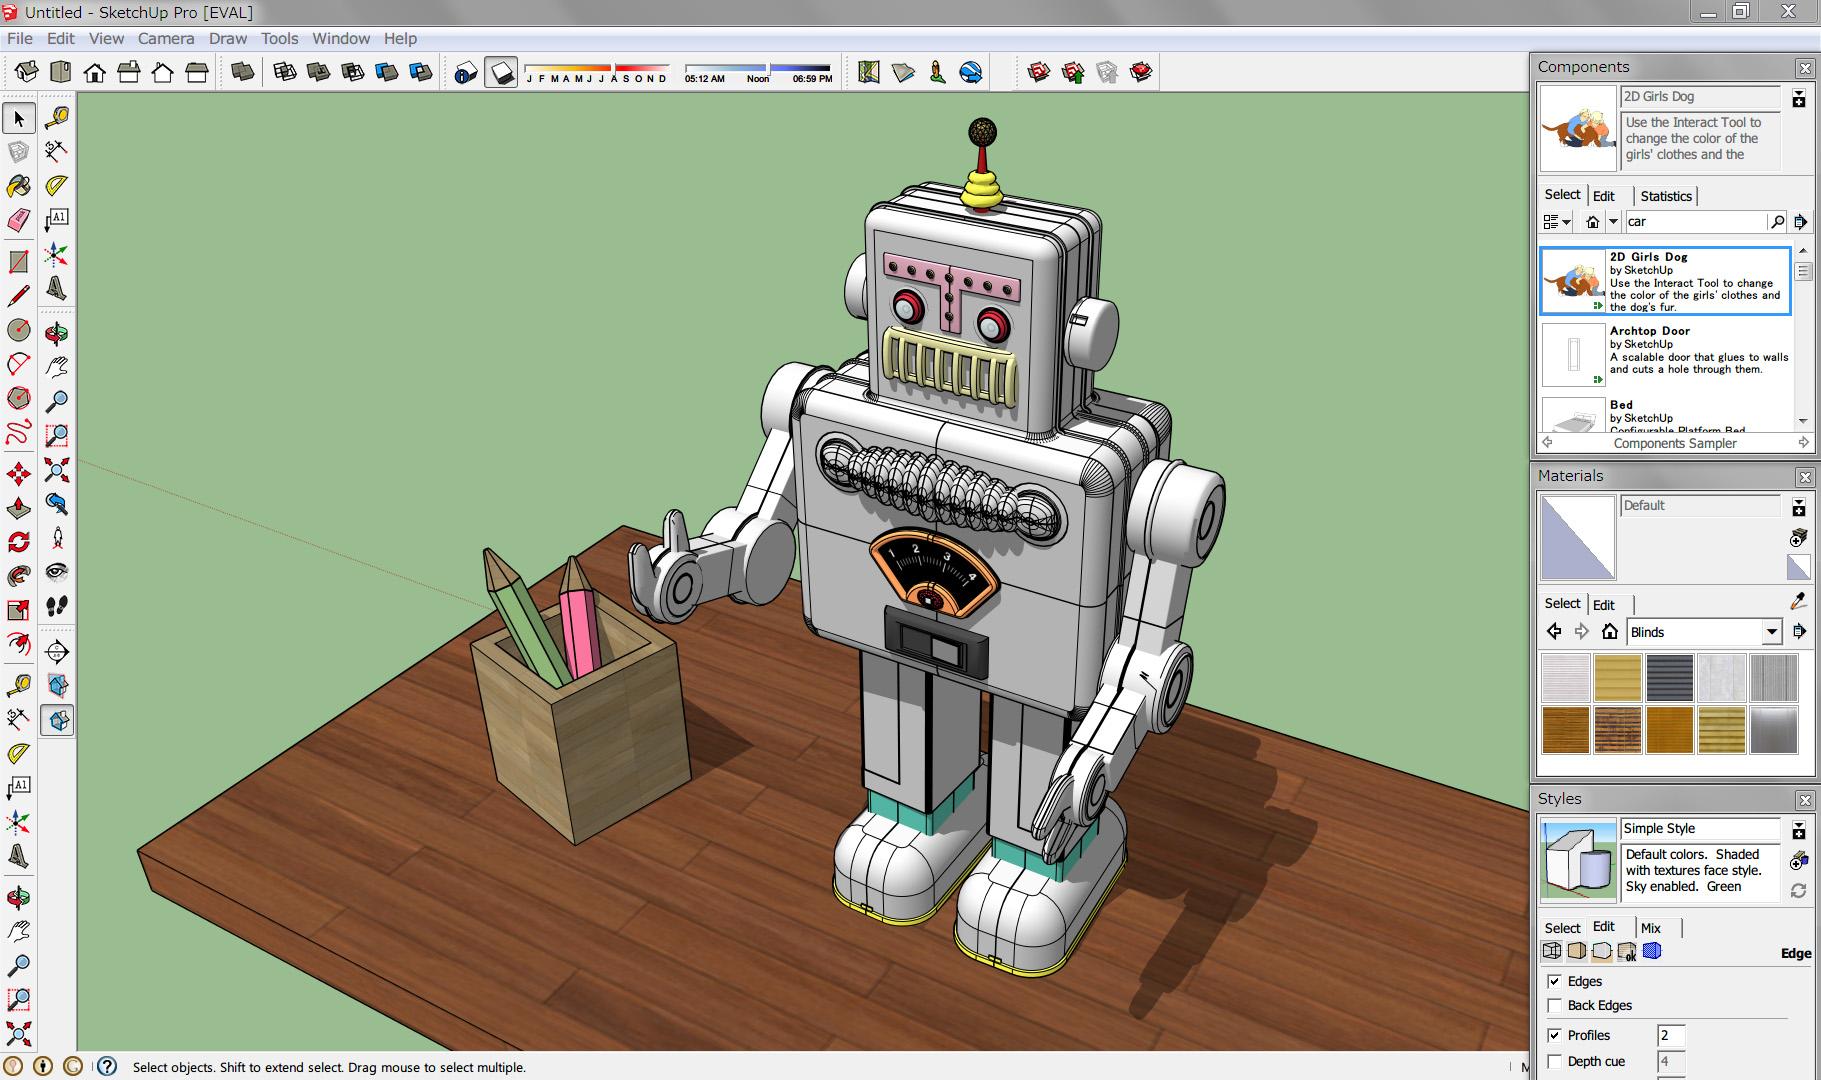 Sketchup 3d Design Software Overview  Think3d